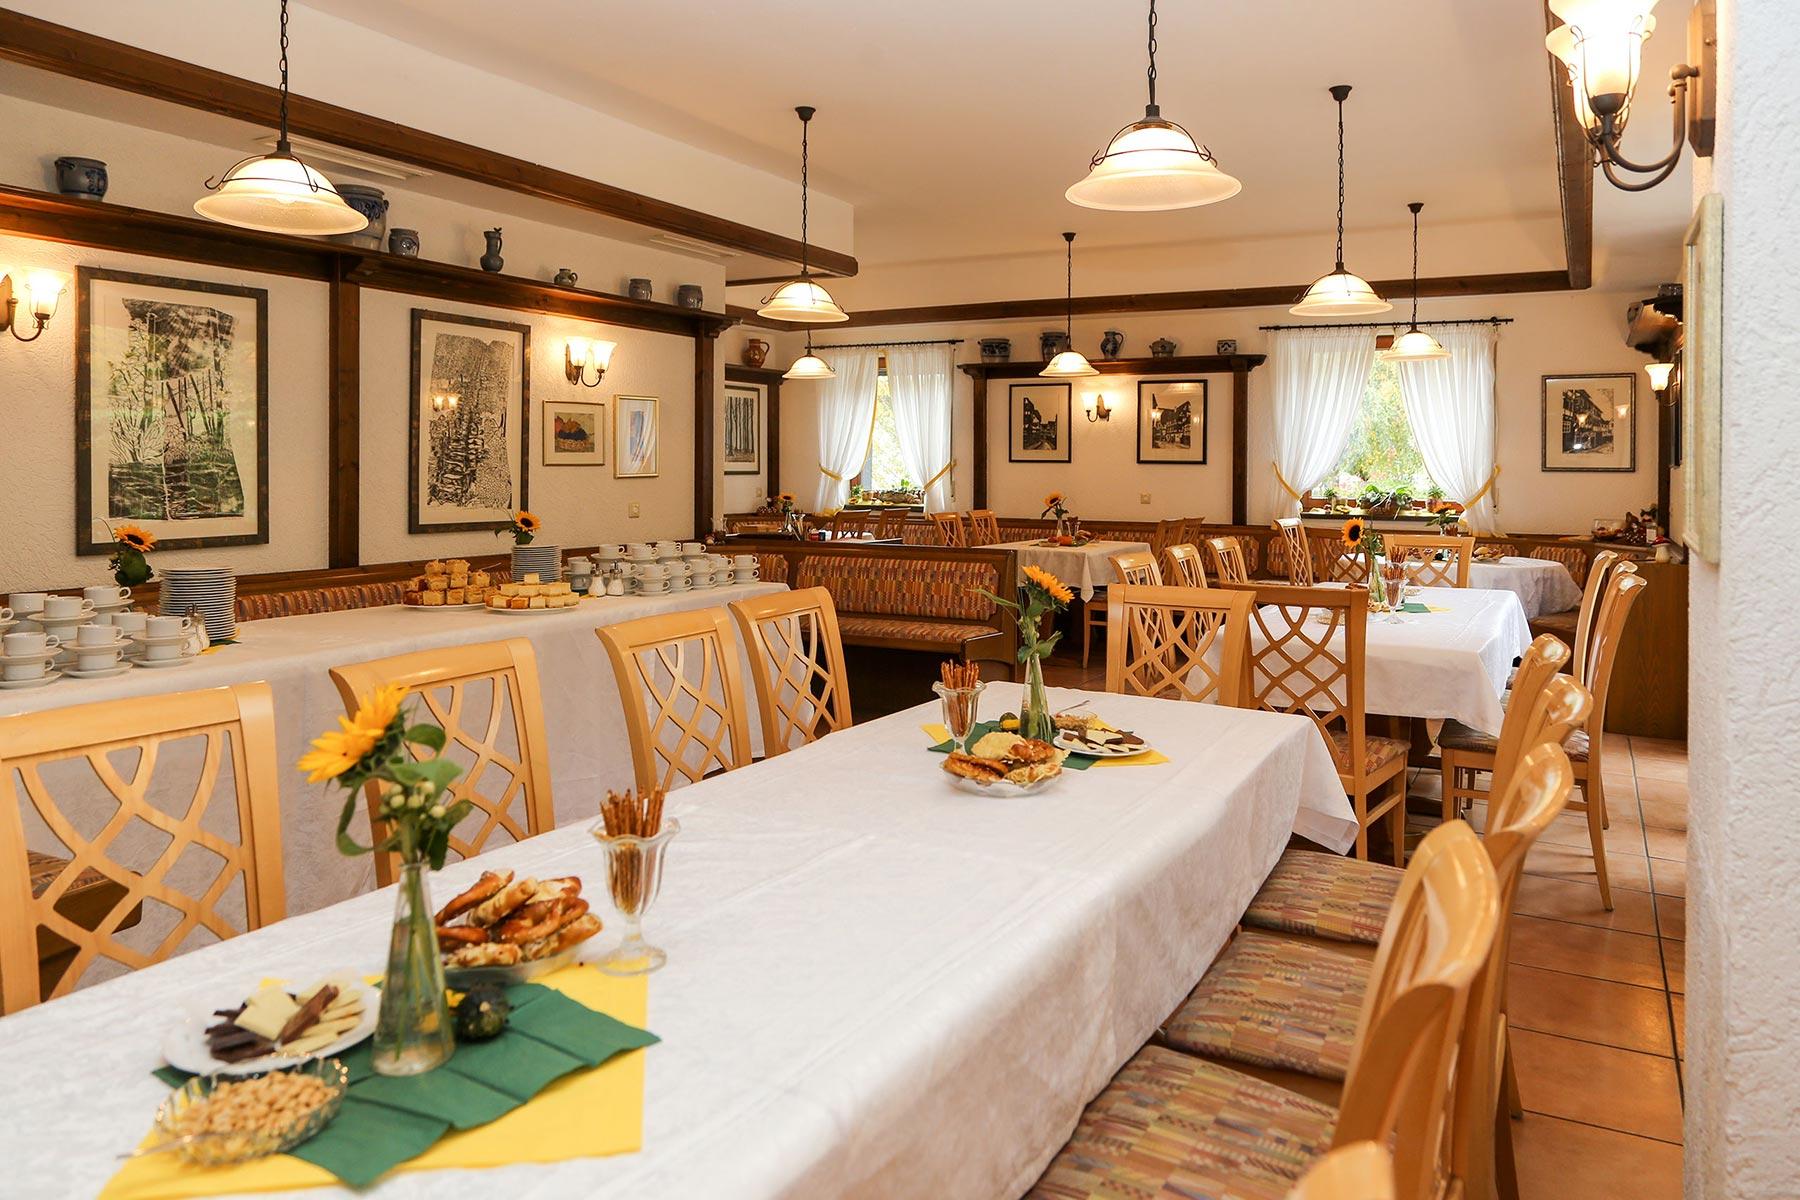 Nebenzimmer Restaurant